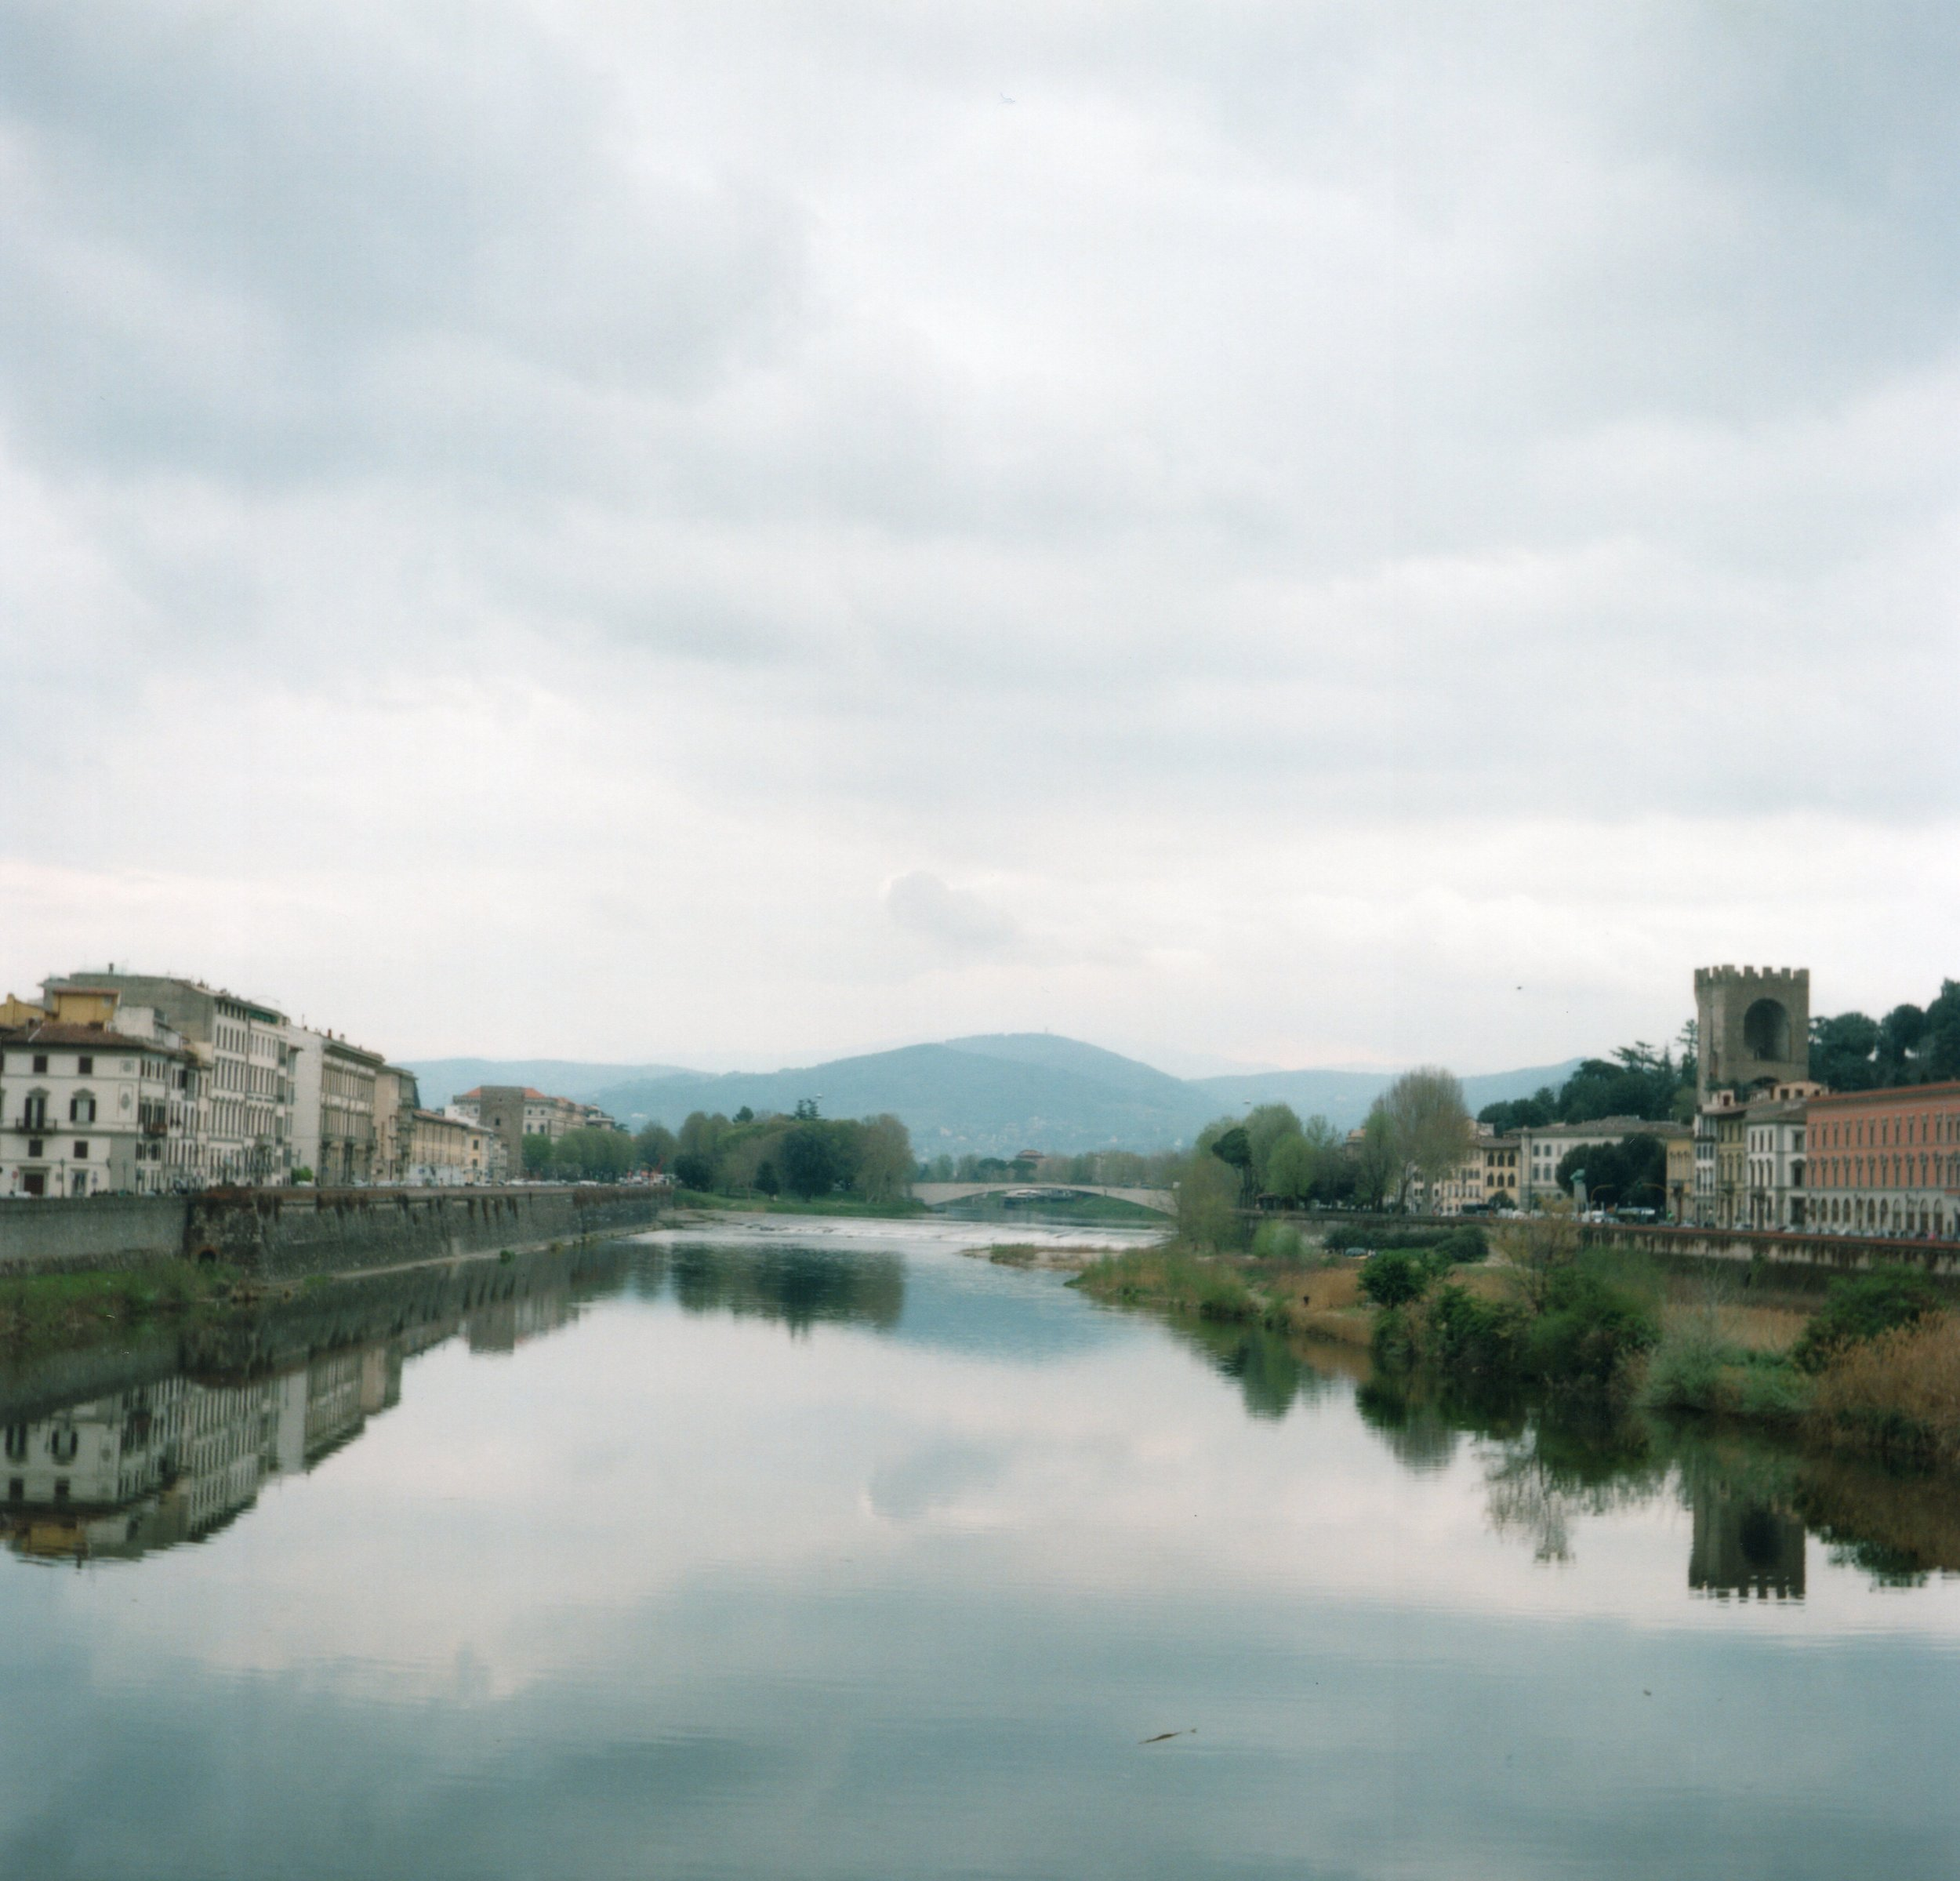 river arno f5.6 500th.jpg.jpg